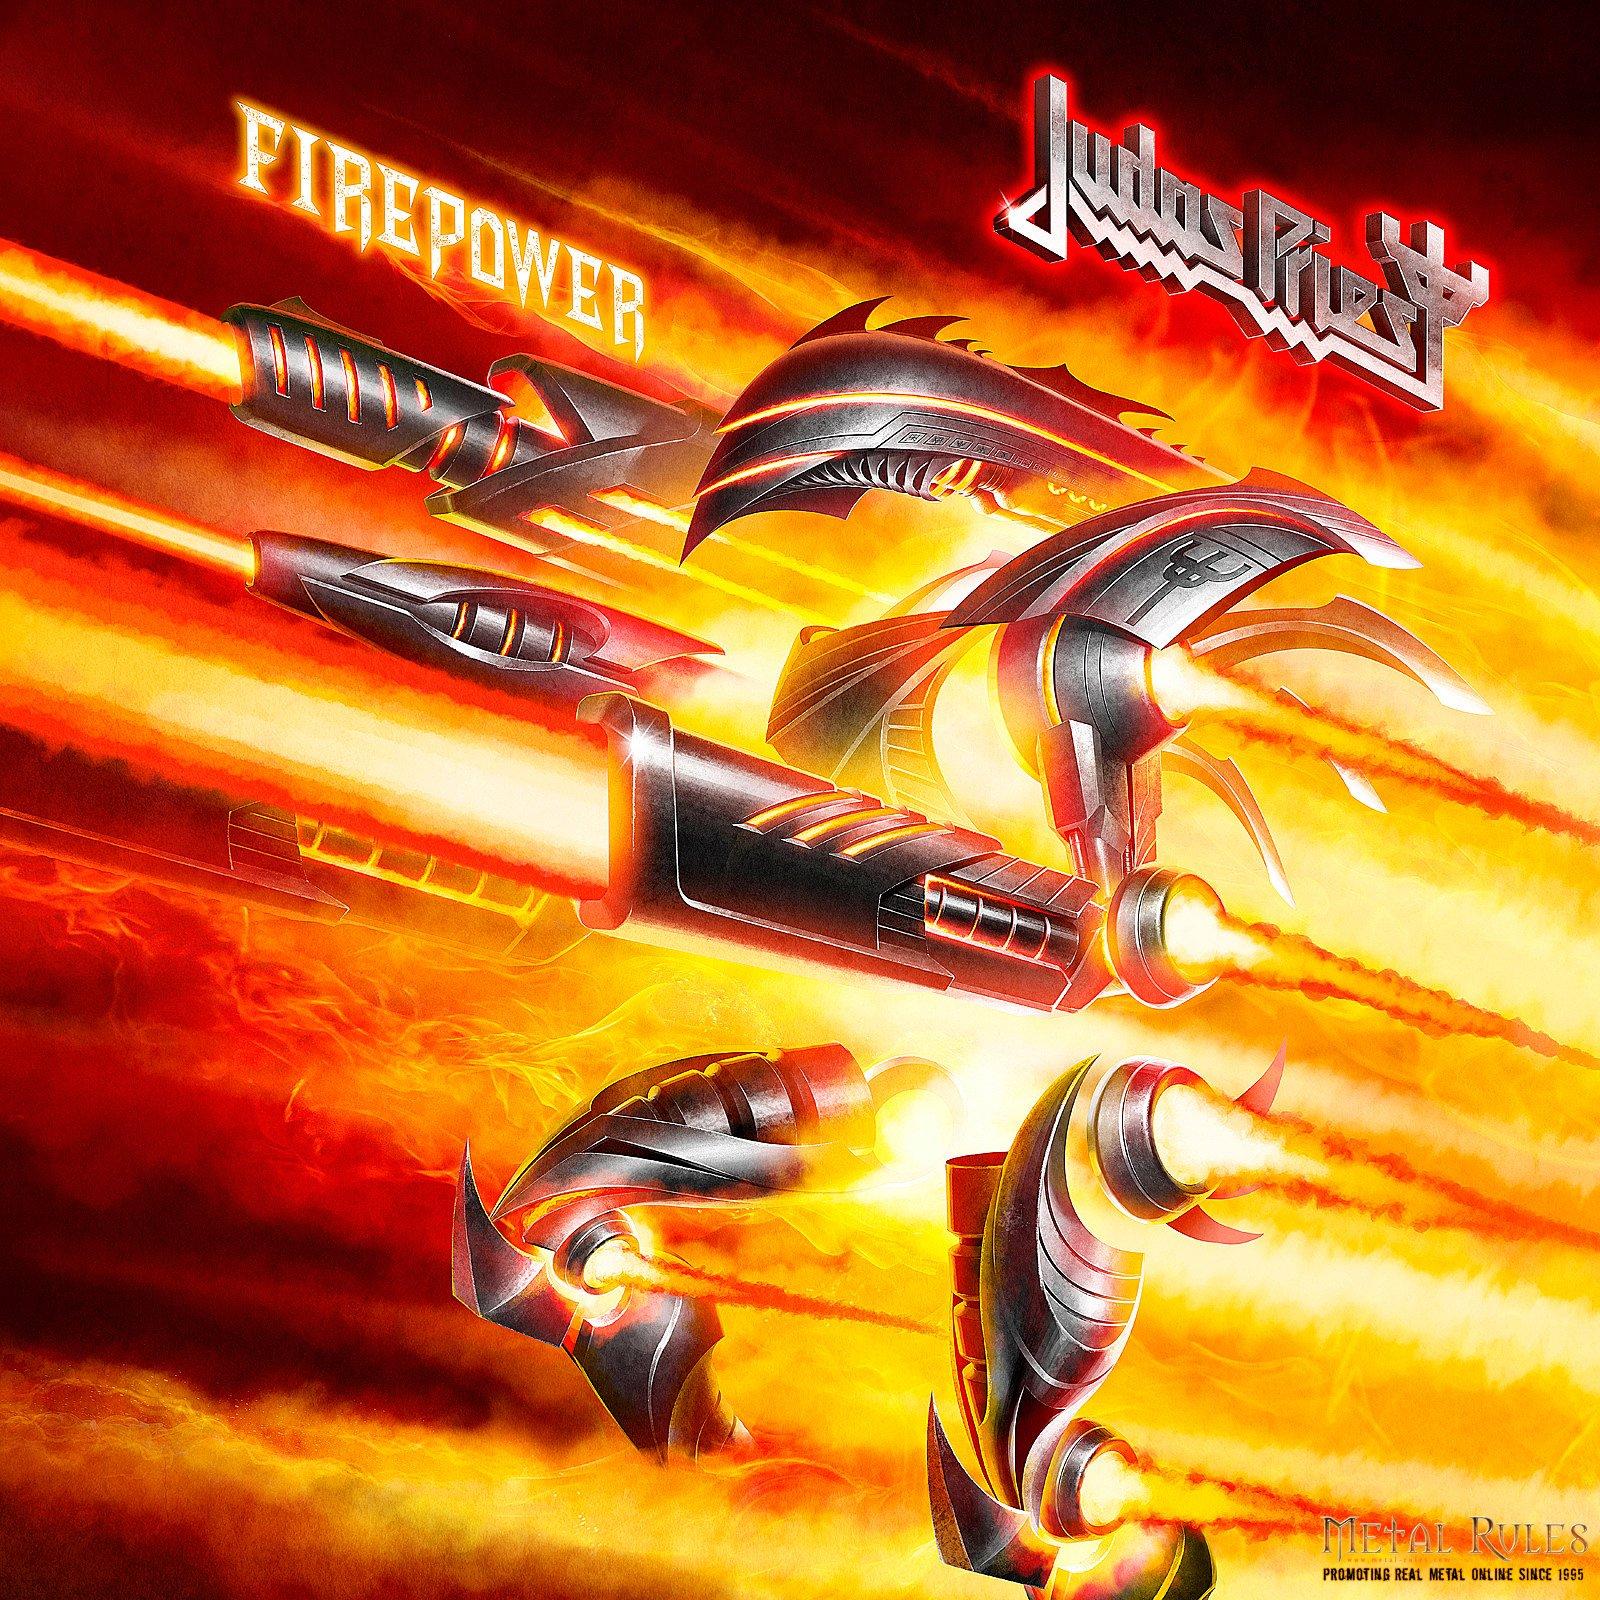 JudasPriest-Firepower.jpg